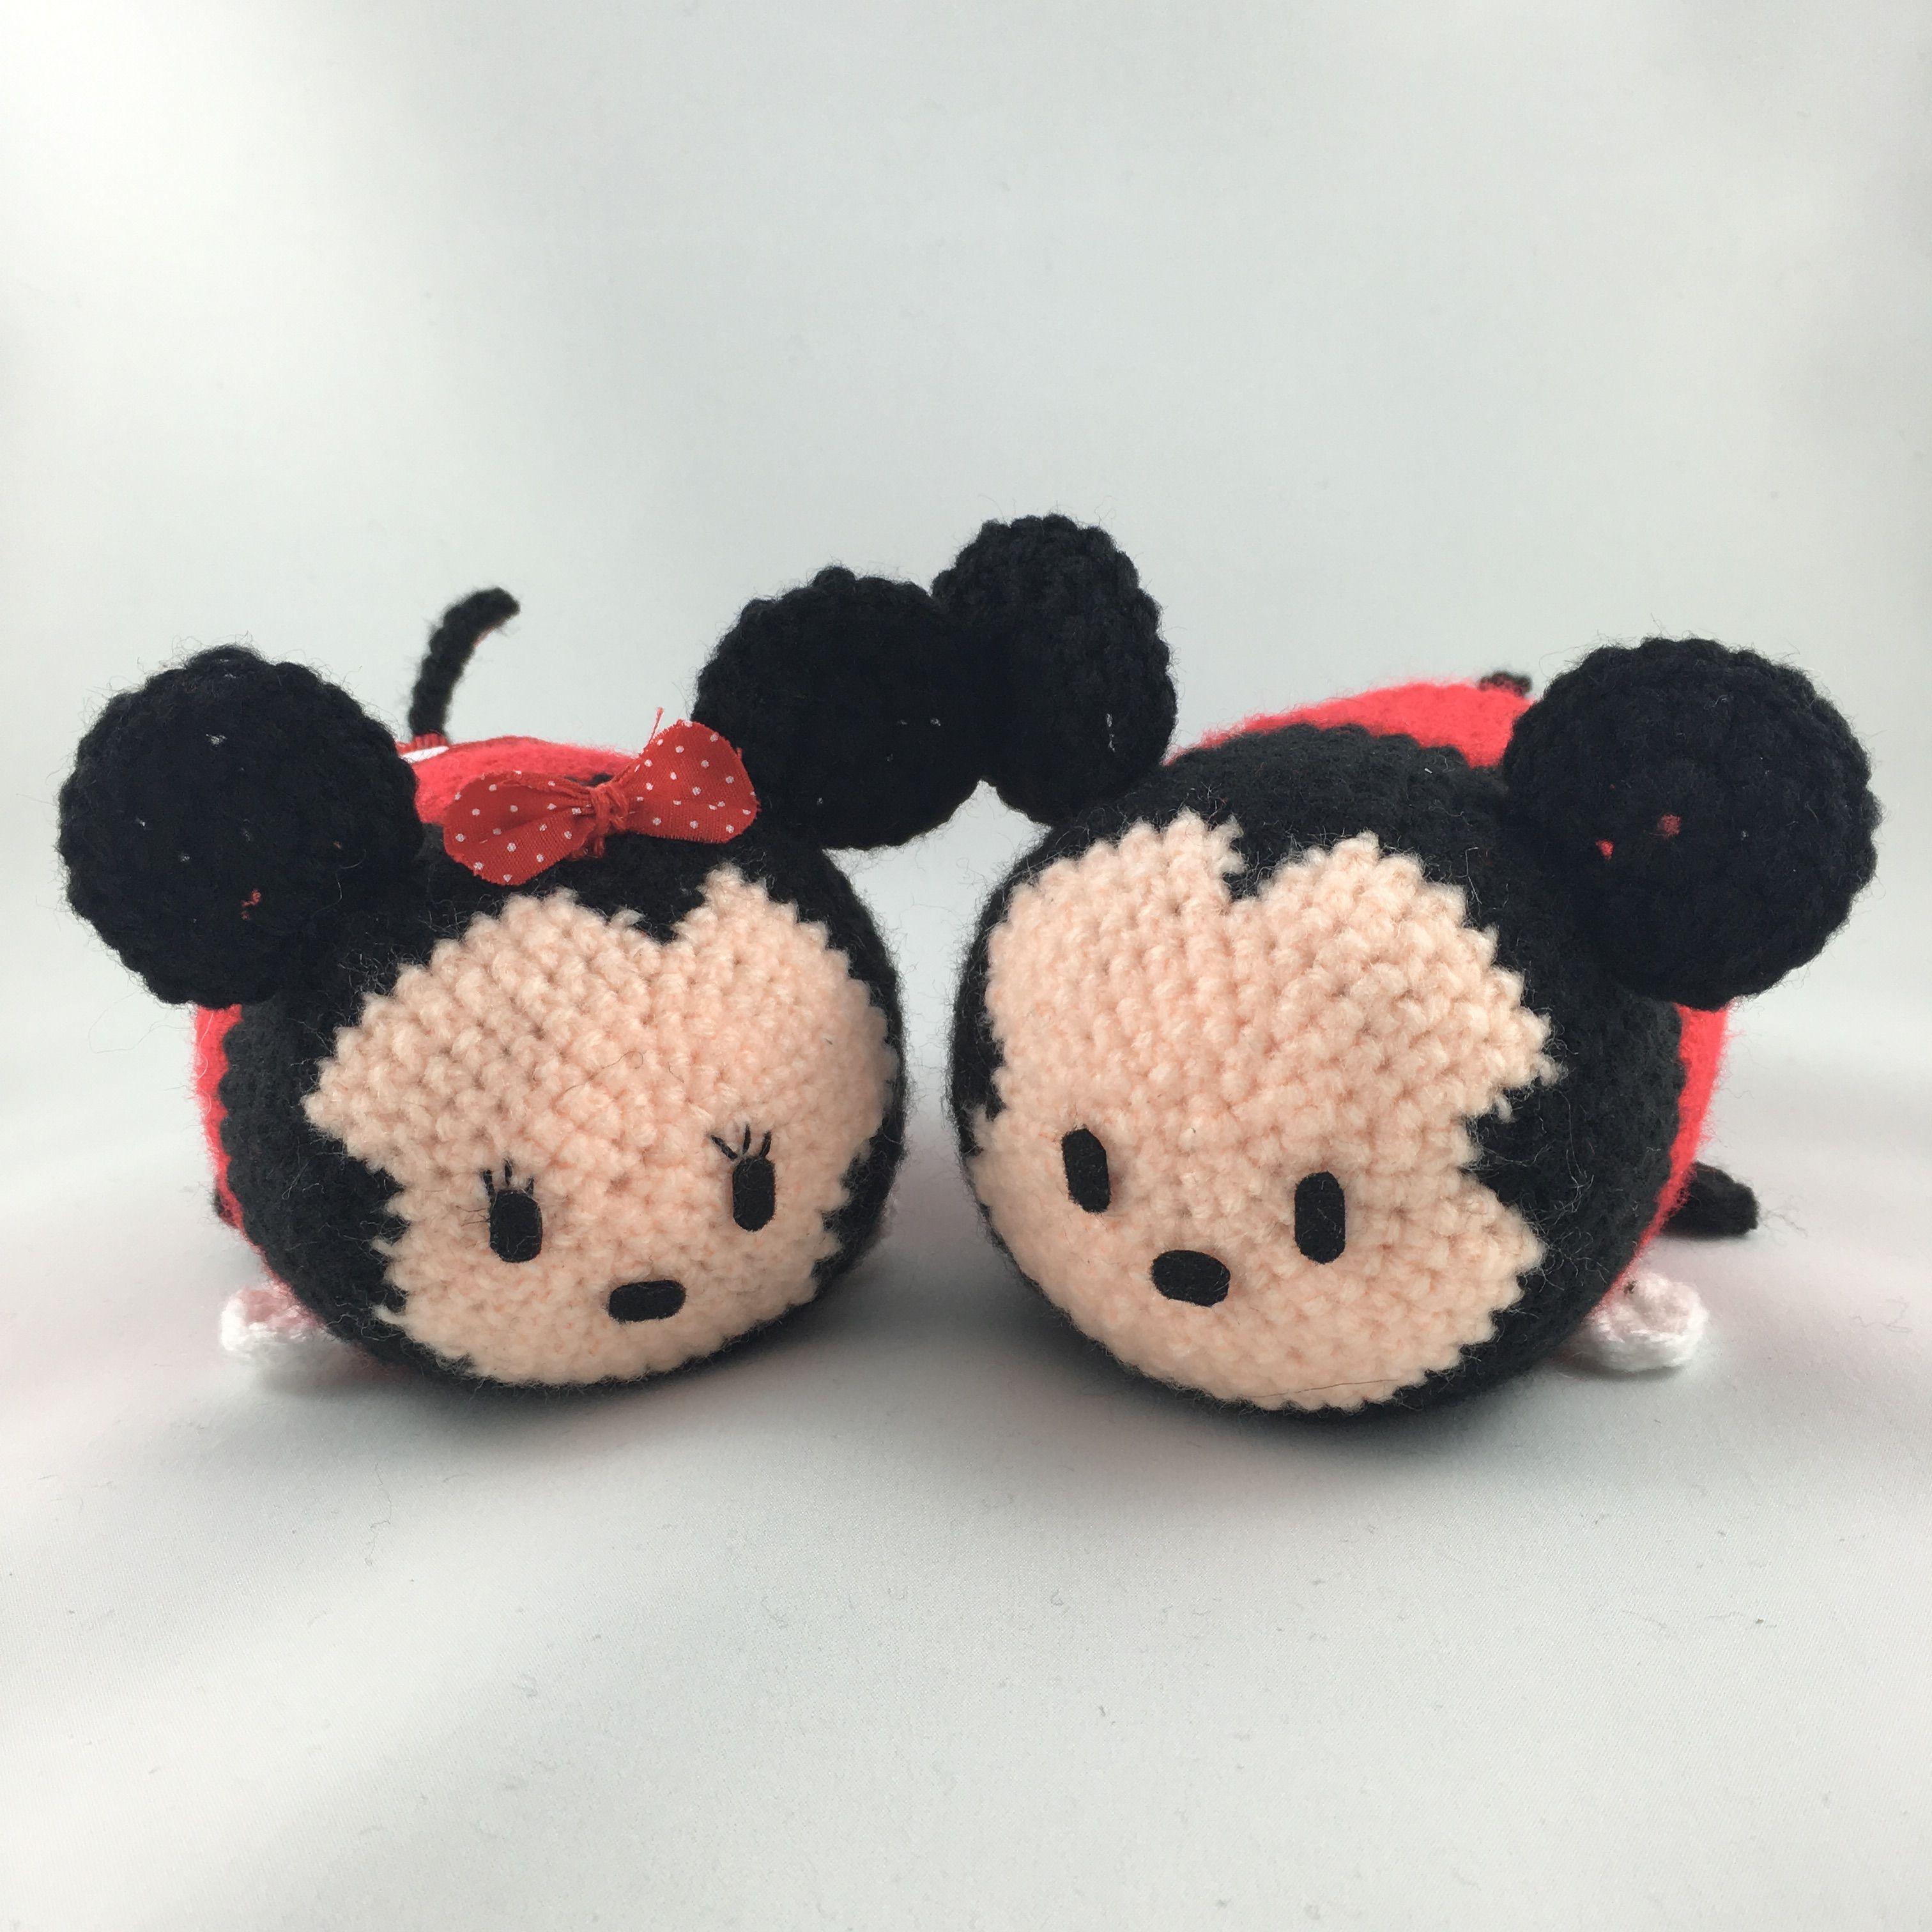 Minnie And Mickey Mouse Tsum Tsum Amigurumi Crochet Disney